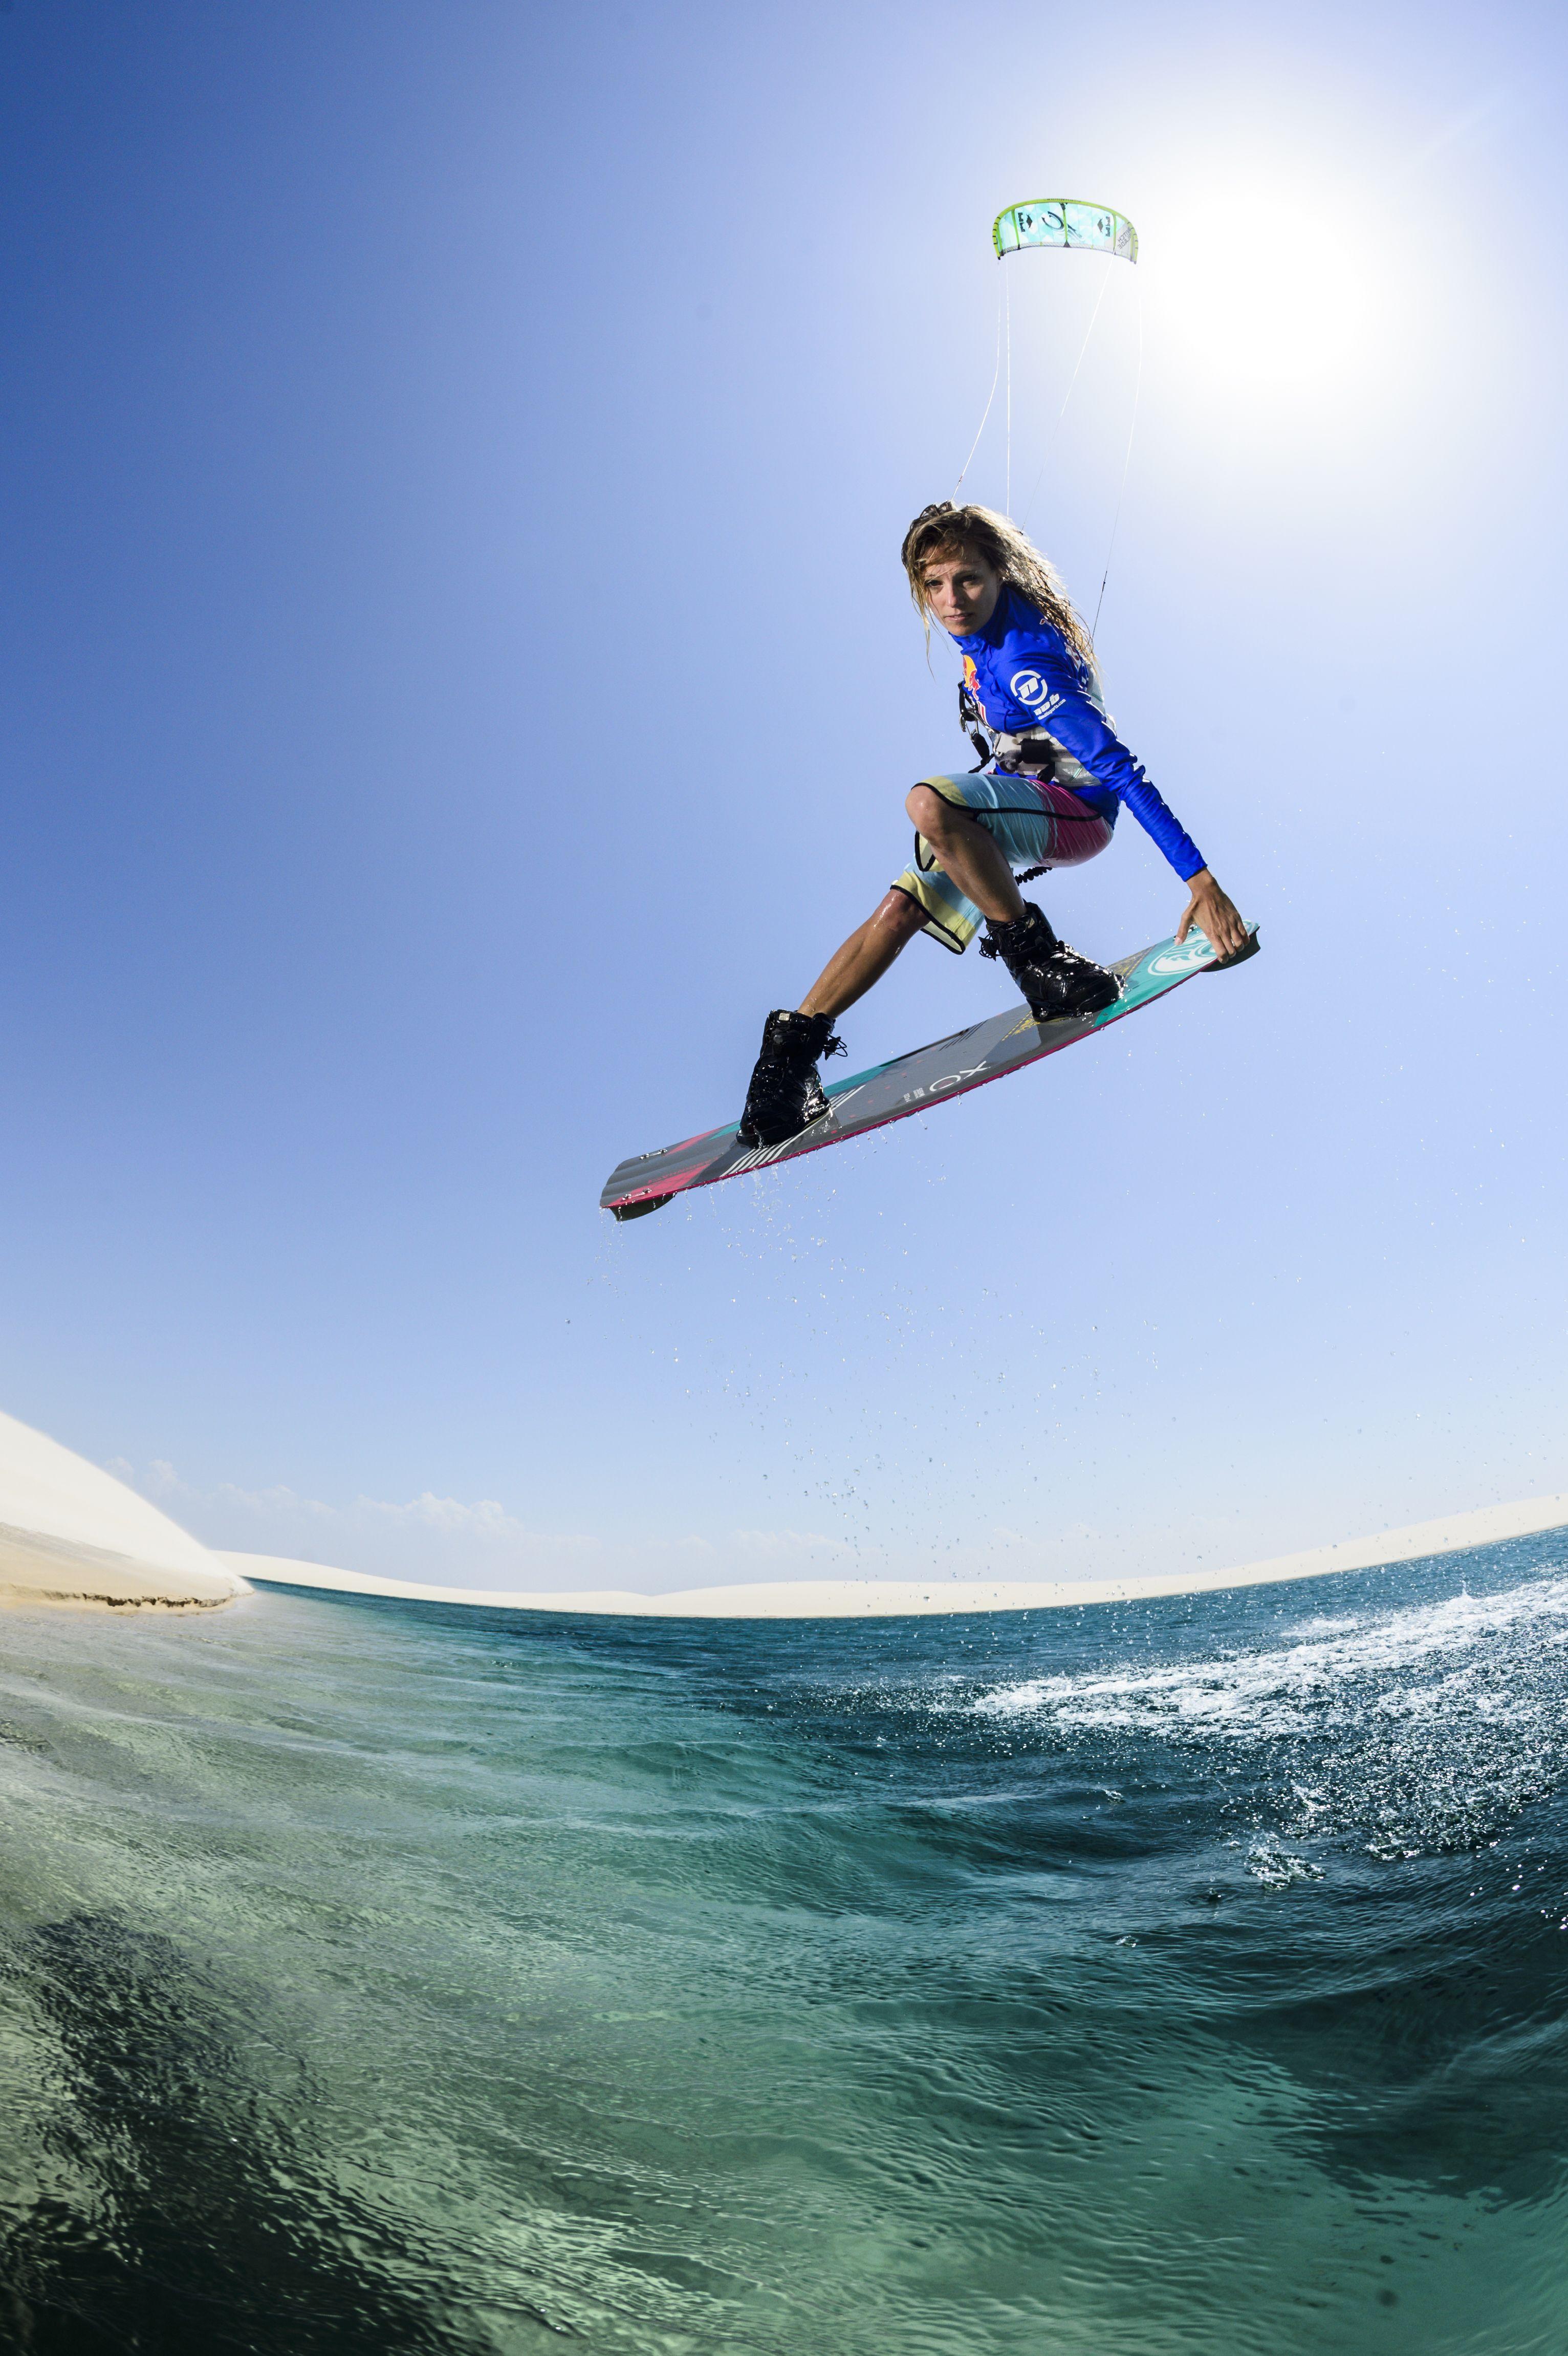 Kiteboarding Kite surfing, Wakeboarding, Surfing